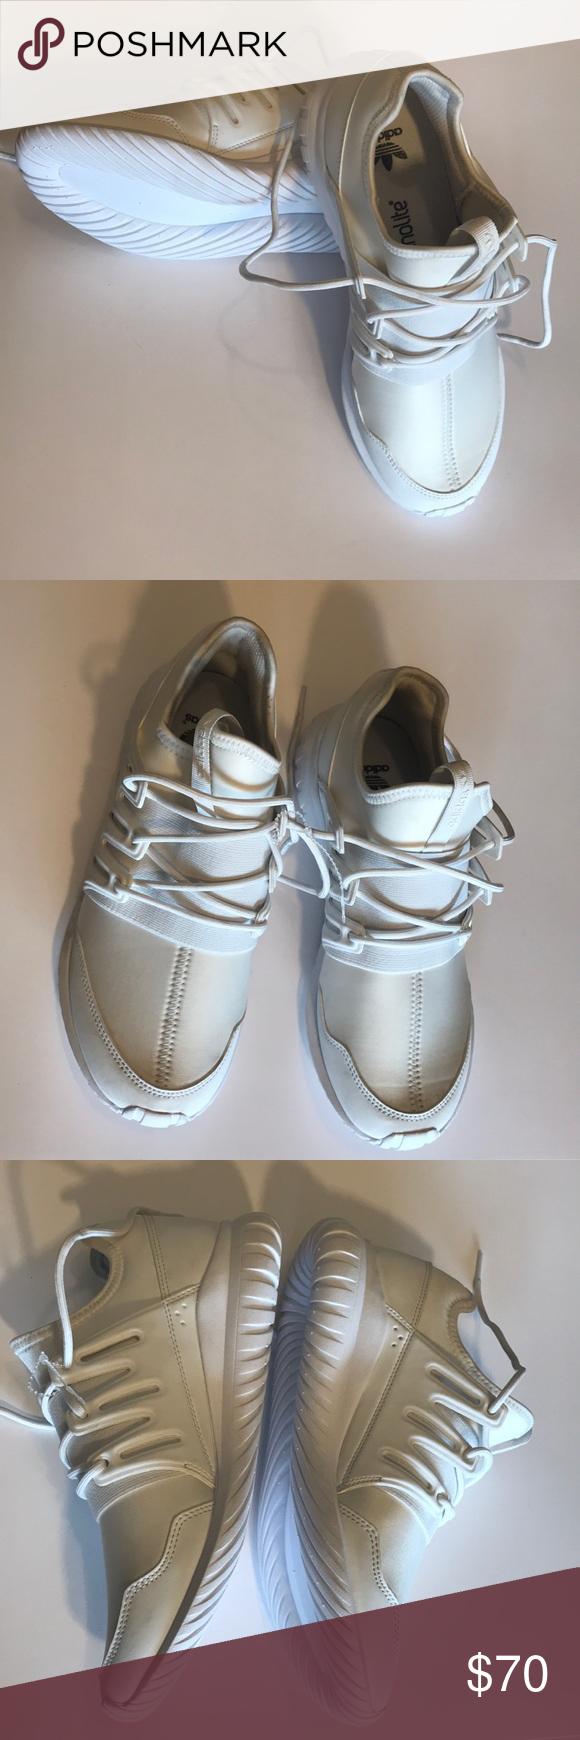 nuevos calcetines Radial ortholite Sox 16487 de calcetines Adidas tubulares NWT Sox | 550dcd9 - accademiadellescienzedellumbria.xyz